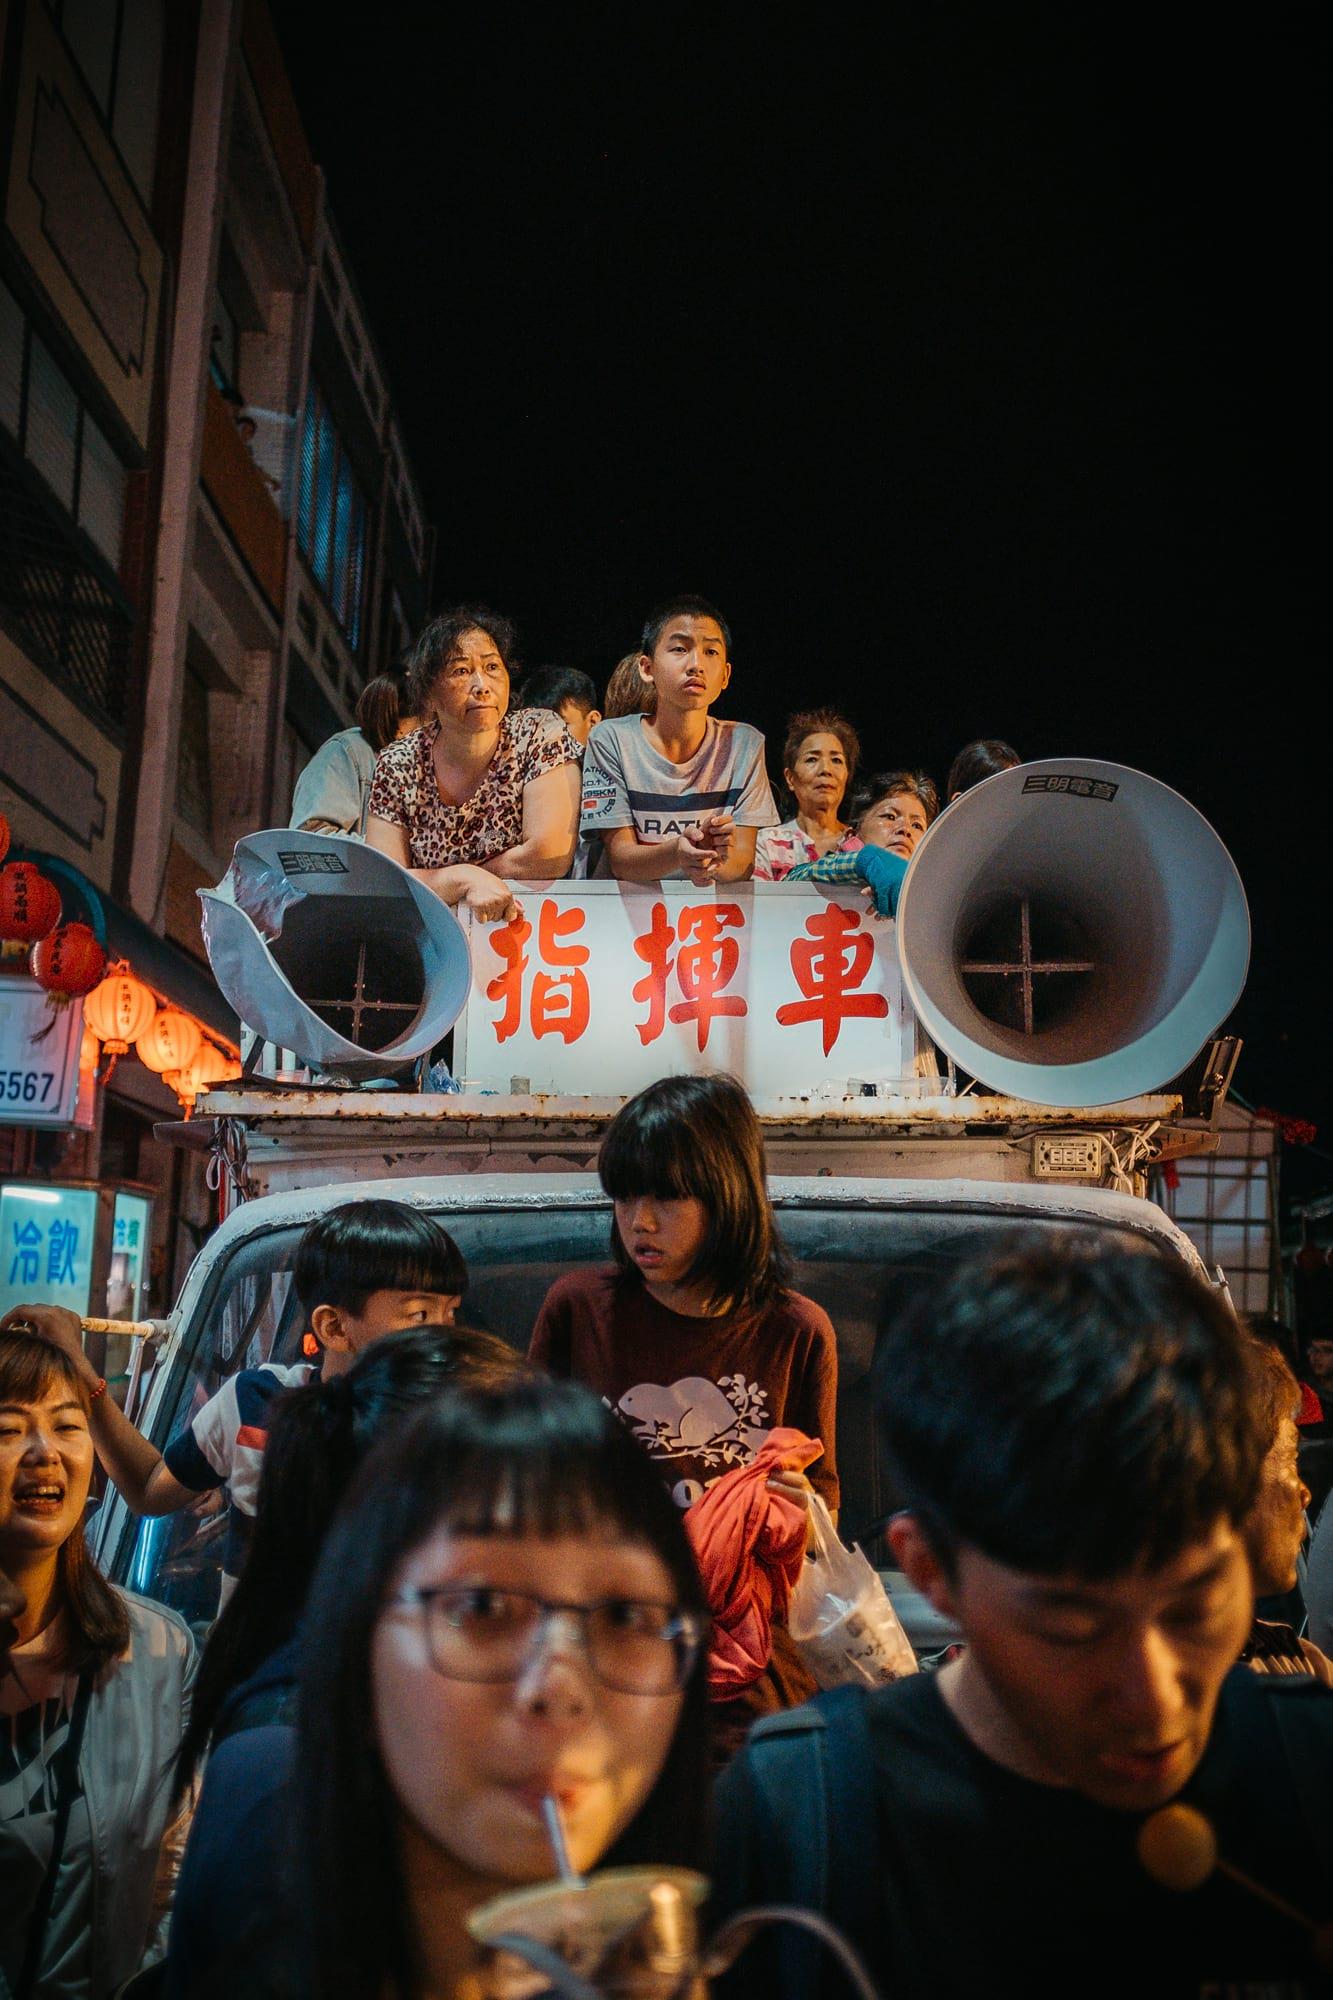 waltsmedia-portrait-taiwan-taipeh-travel-reise-69